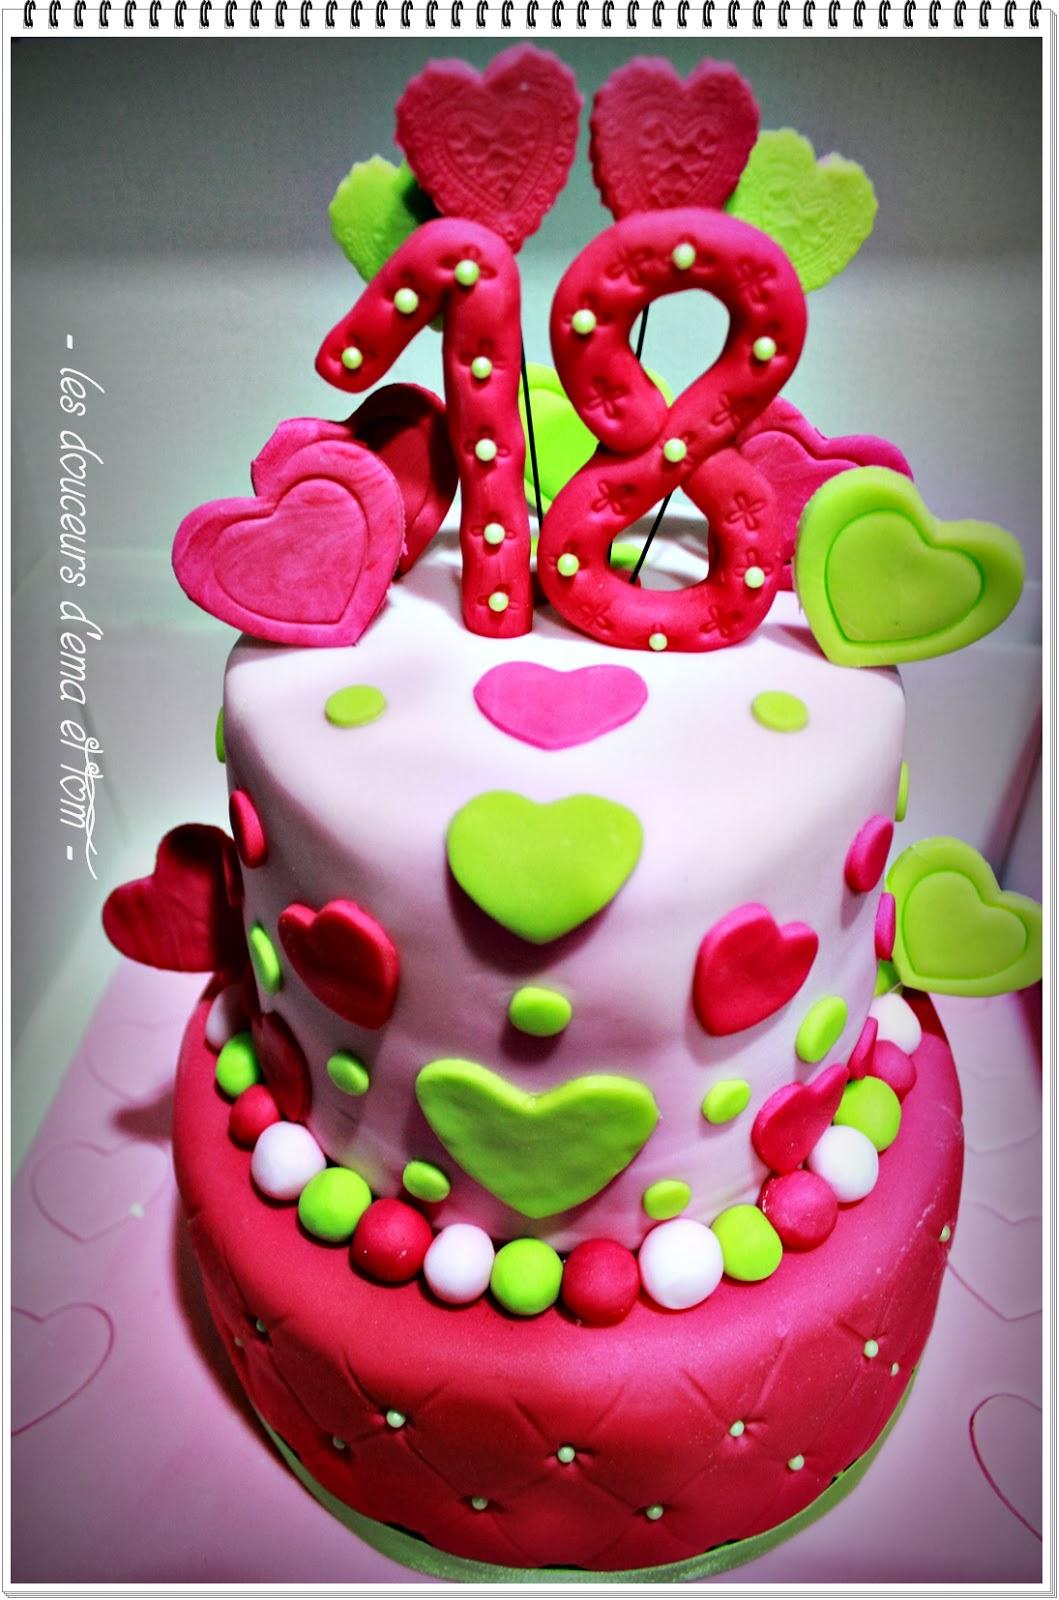 Concours Cake Design